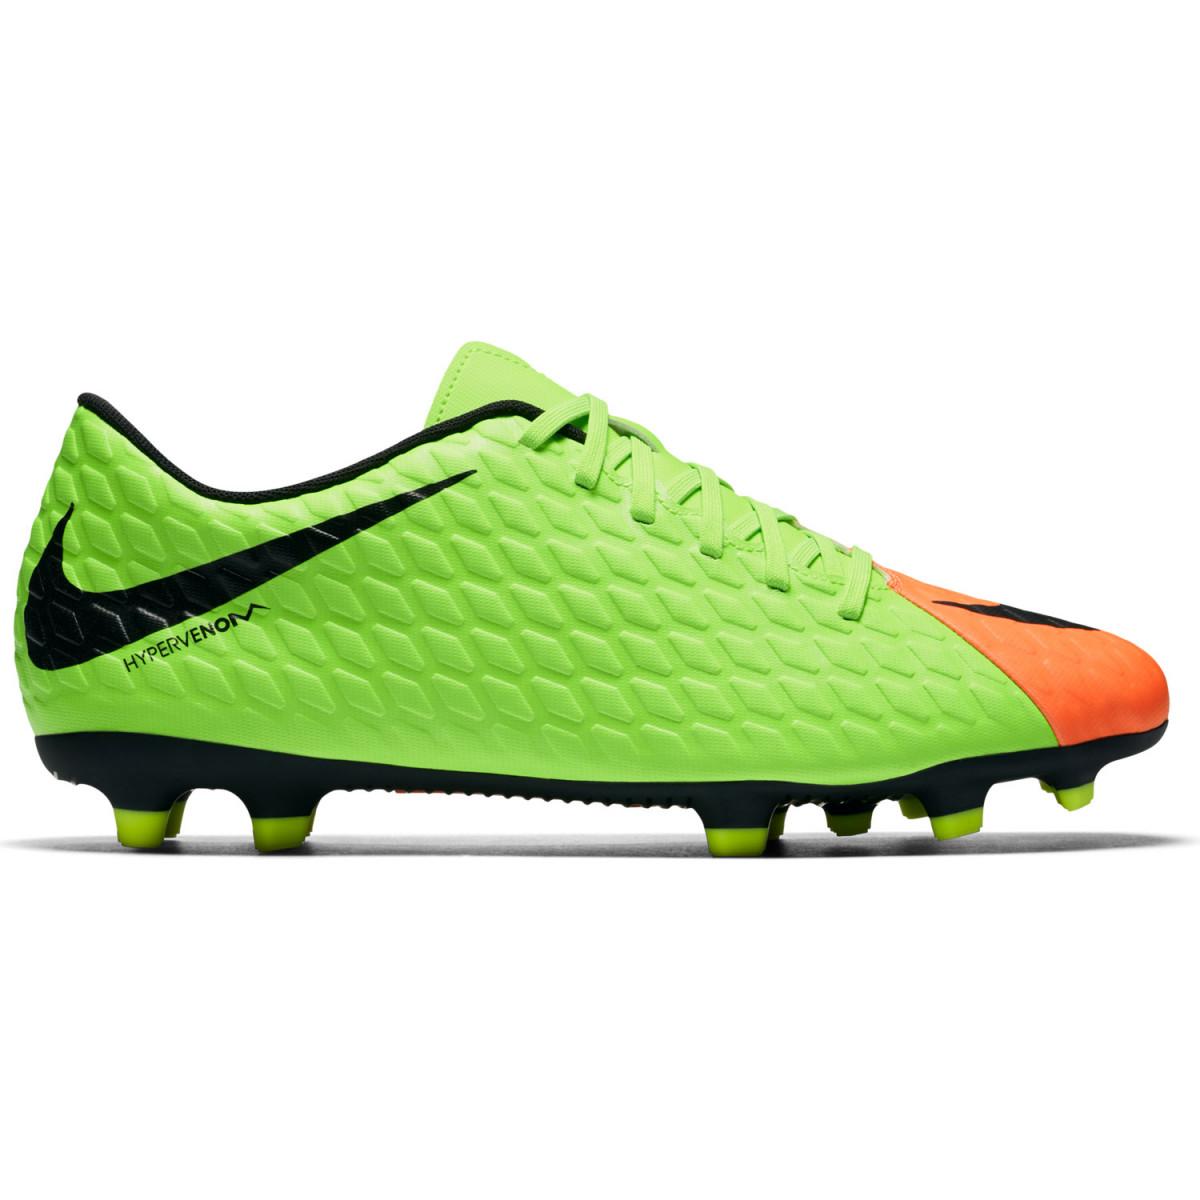 083dc19dc8d23 Botines Nike Hypervenom Phade III Fg